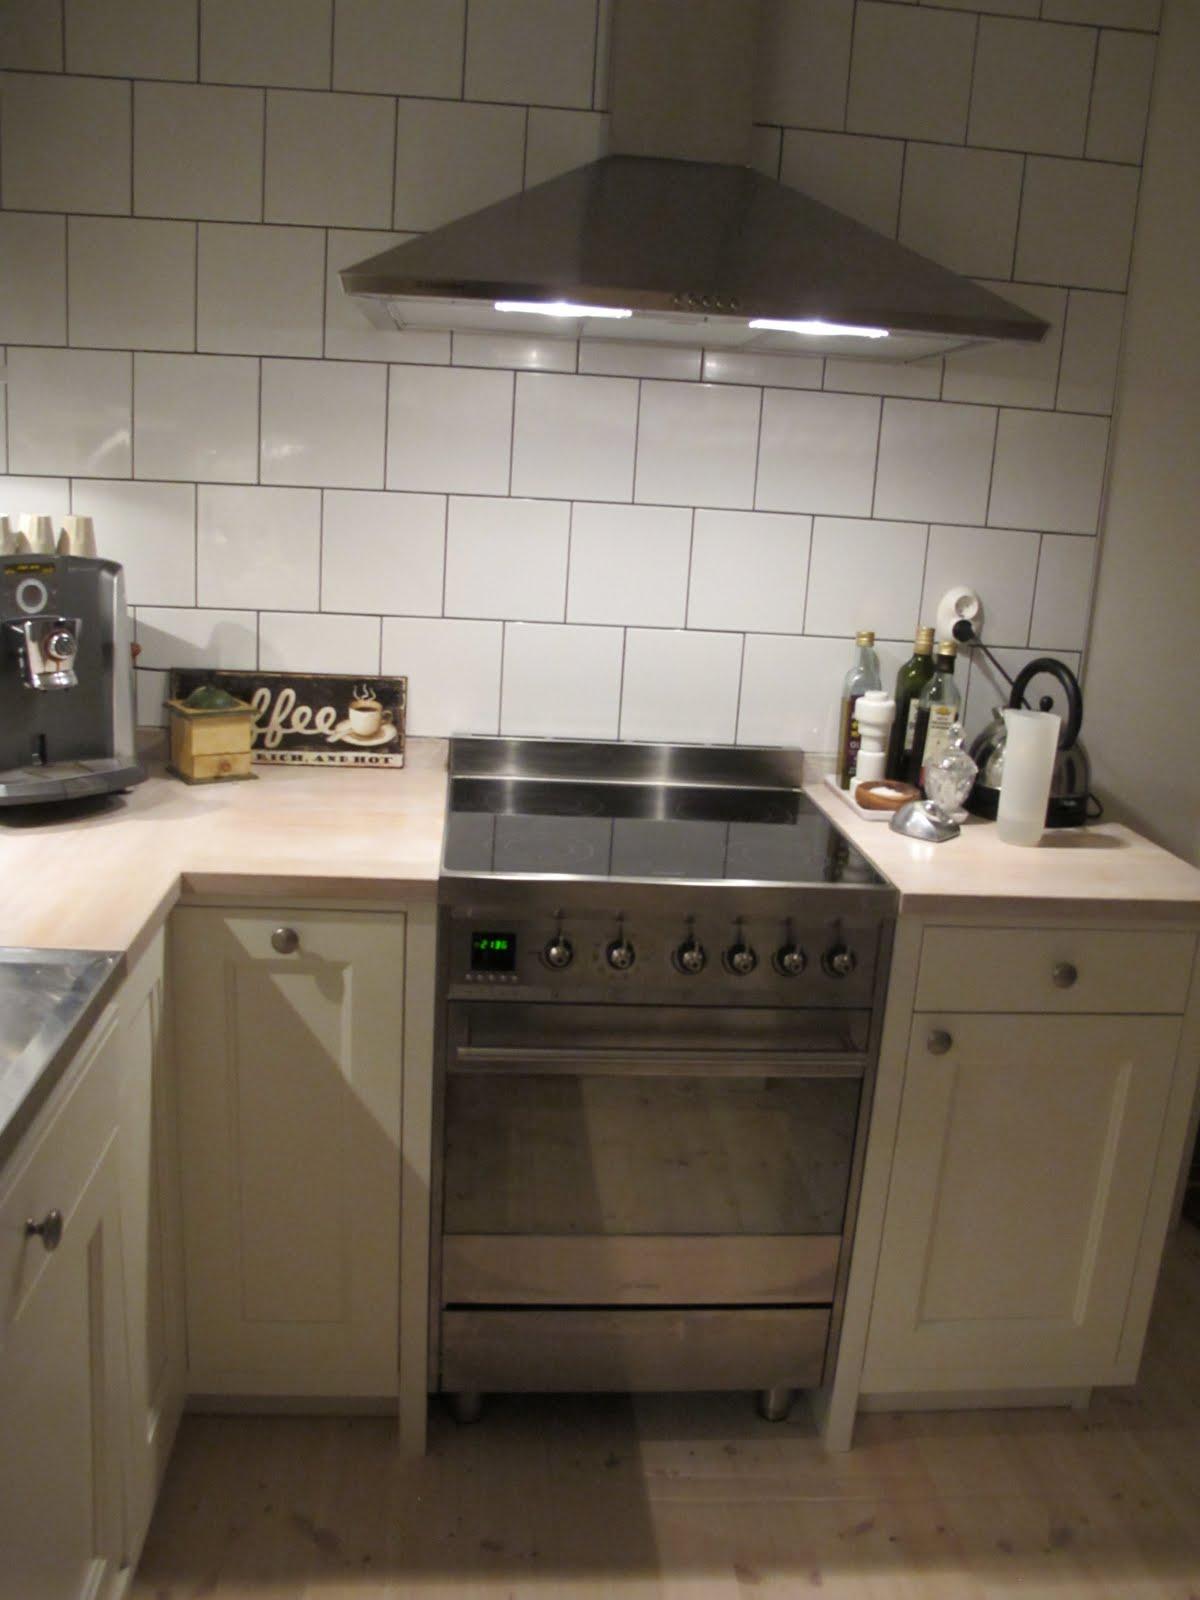 Lundins Kok I Hestra : Porslinet forvaras for tillfollet i det hor lilla skopet i